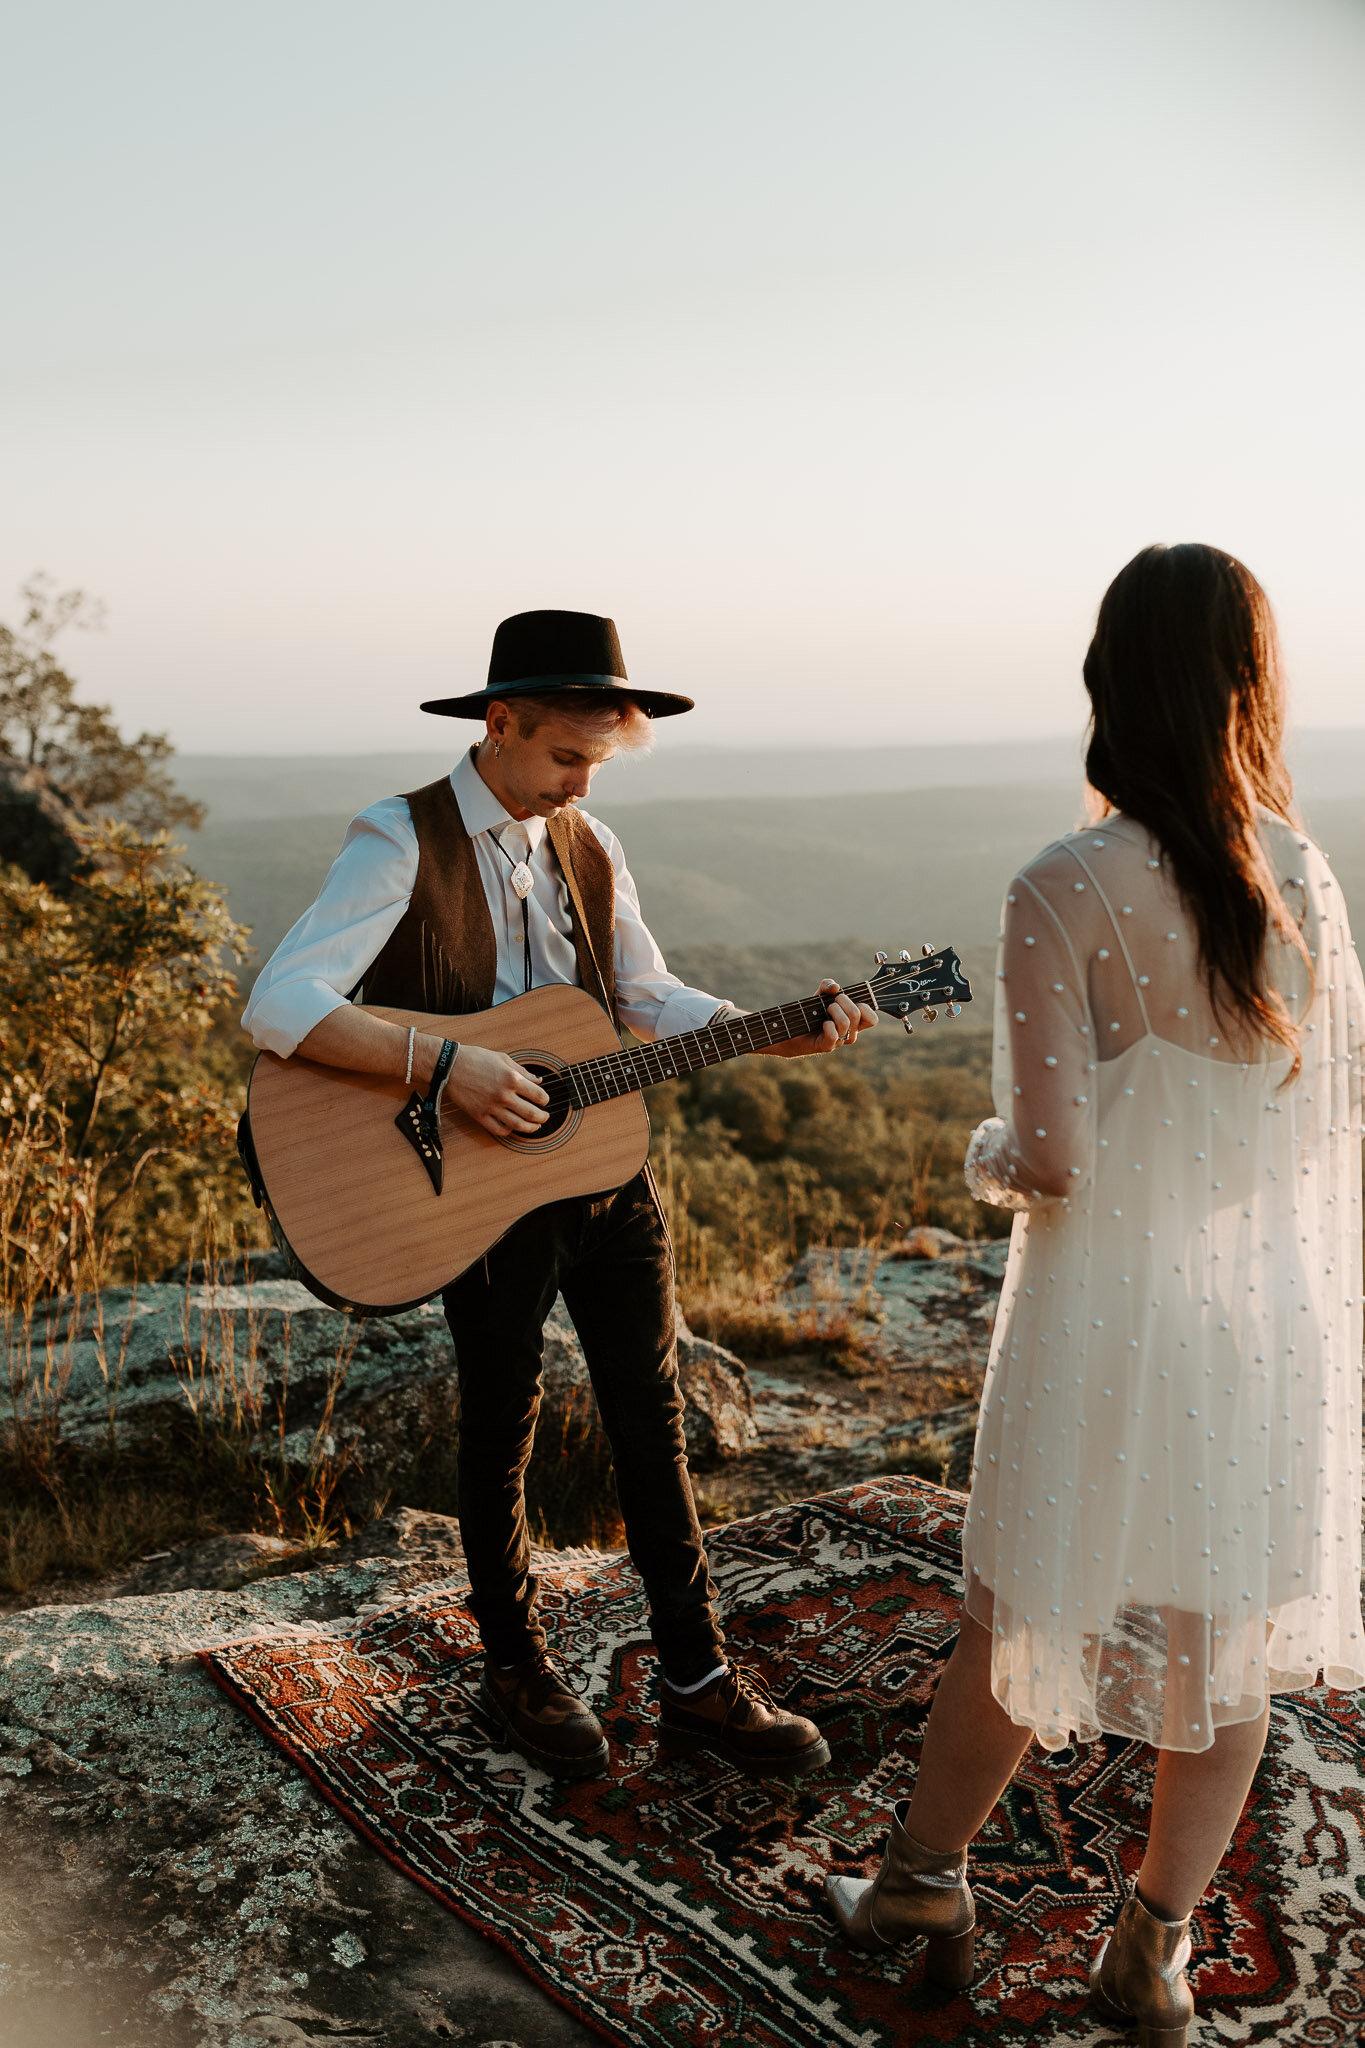 laura lee powers photo arkansas mountain wedding elopement -1020.jpg